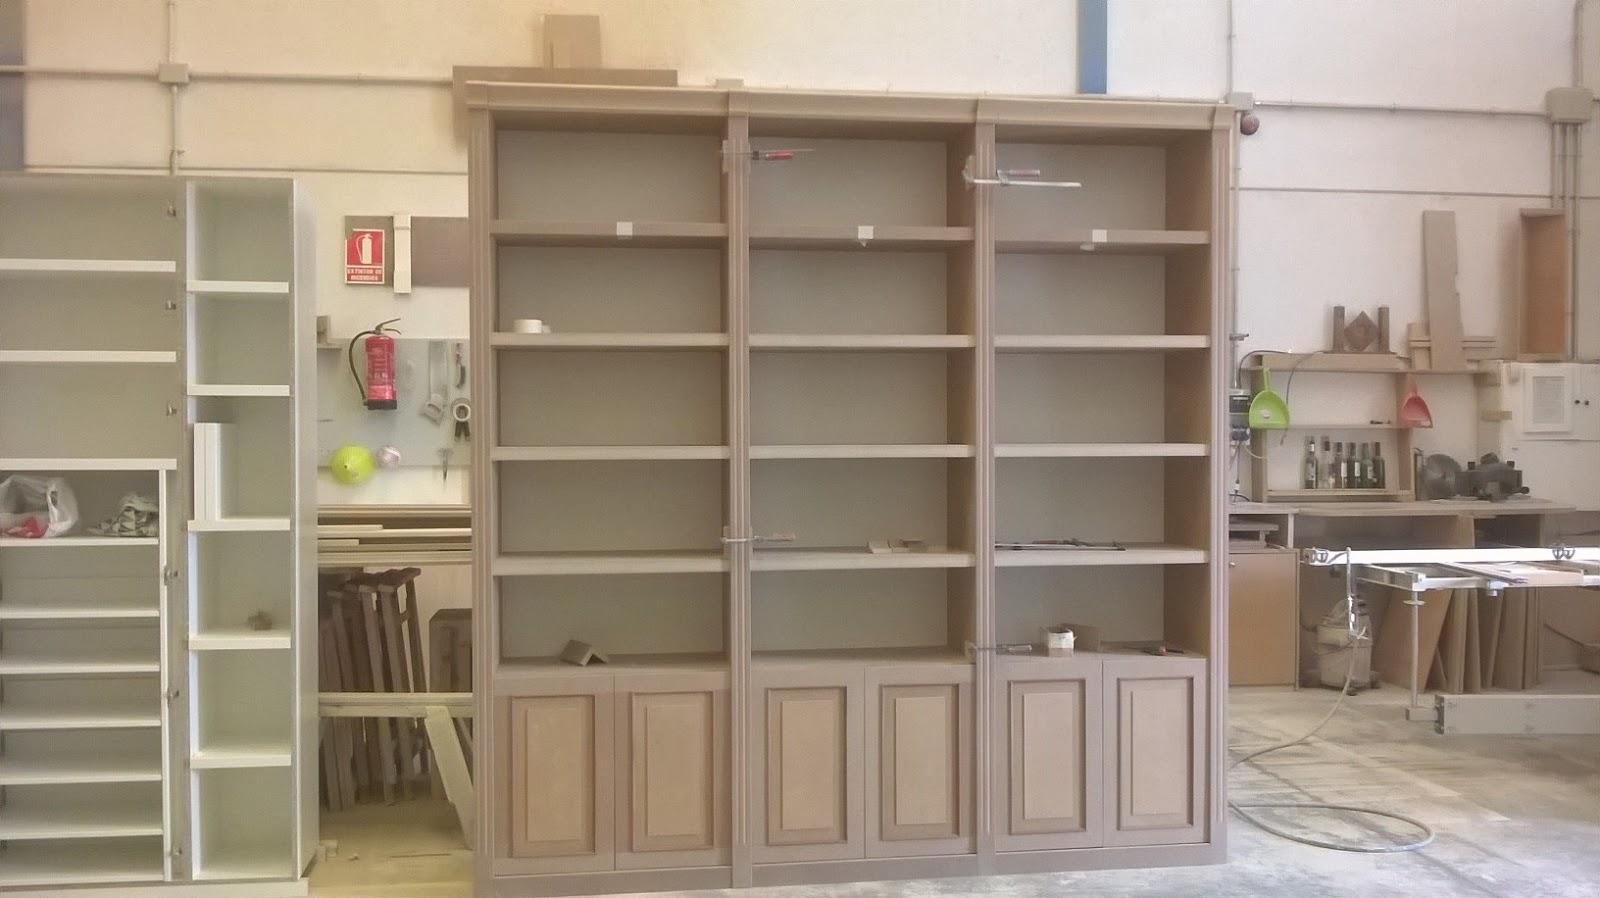 Libreria a medida madrid mueble a medida 617075183 for Mueble kansas